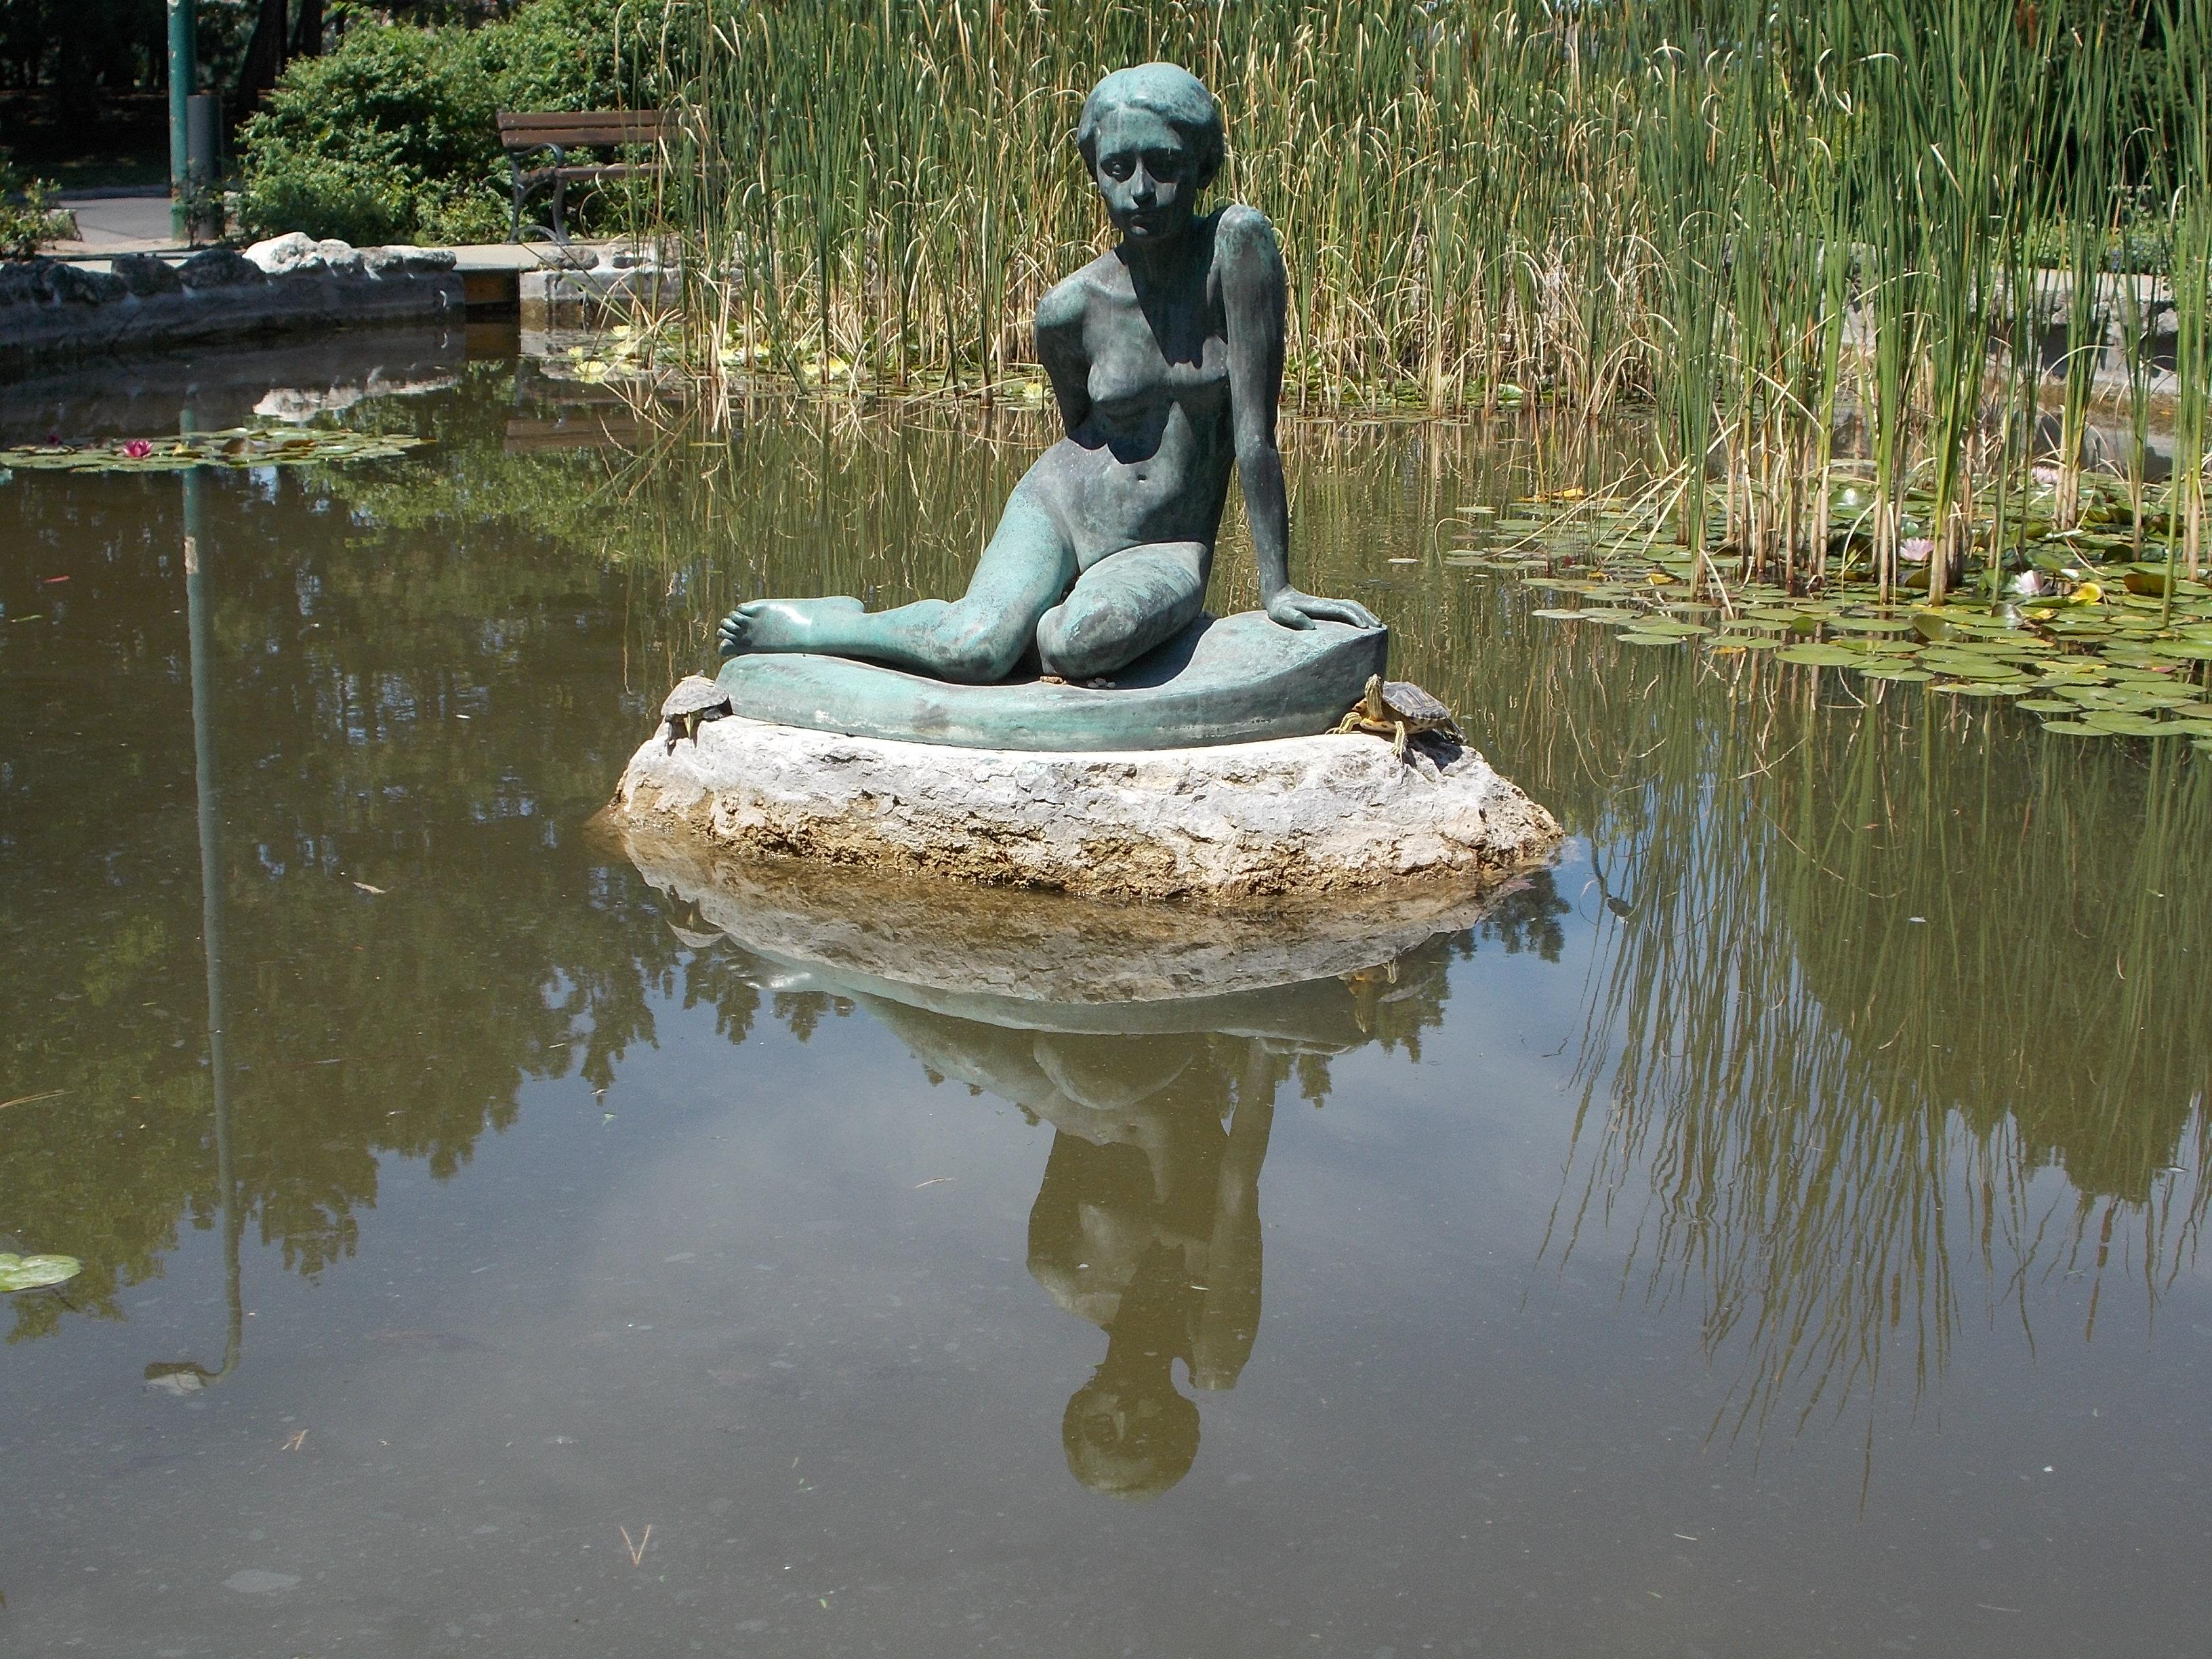 Delicieux File:Japanese Garden. Sitting Girl Statue (Imre Csikász, 1932).